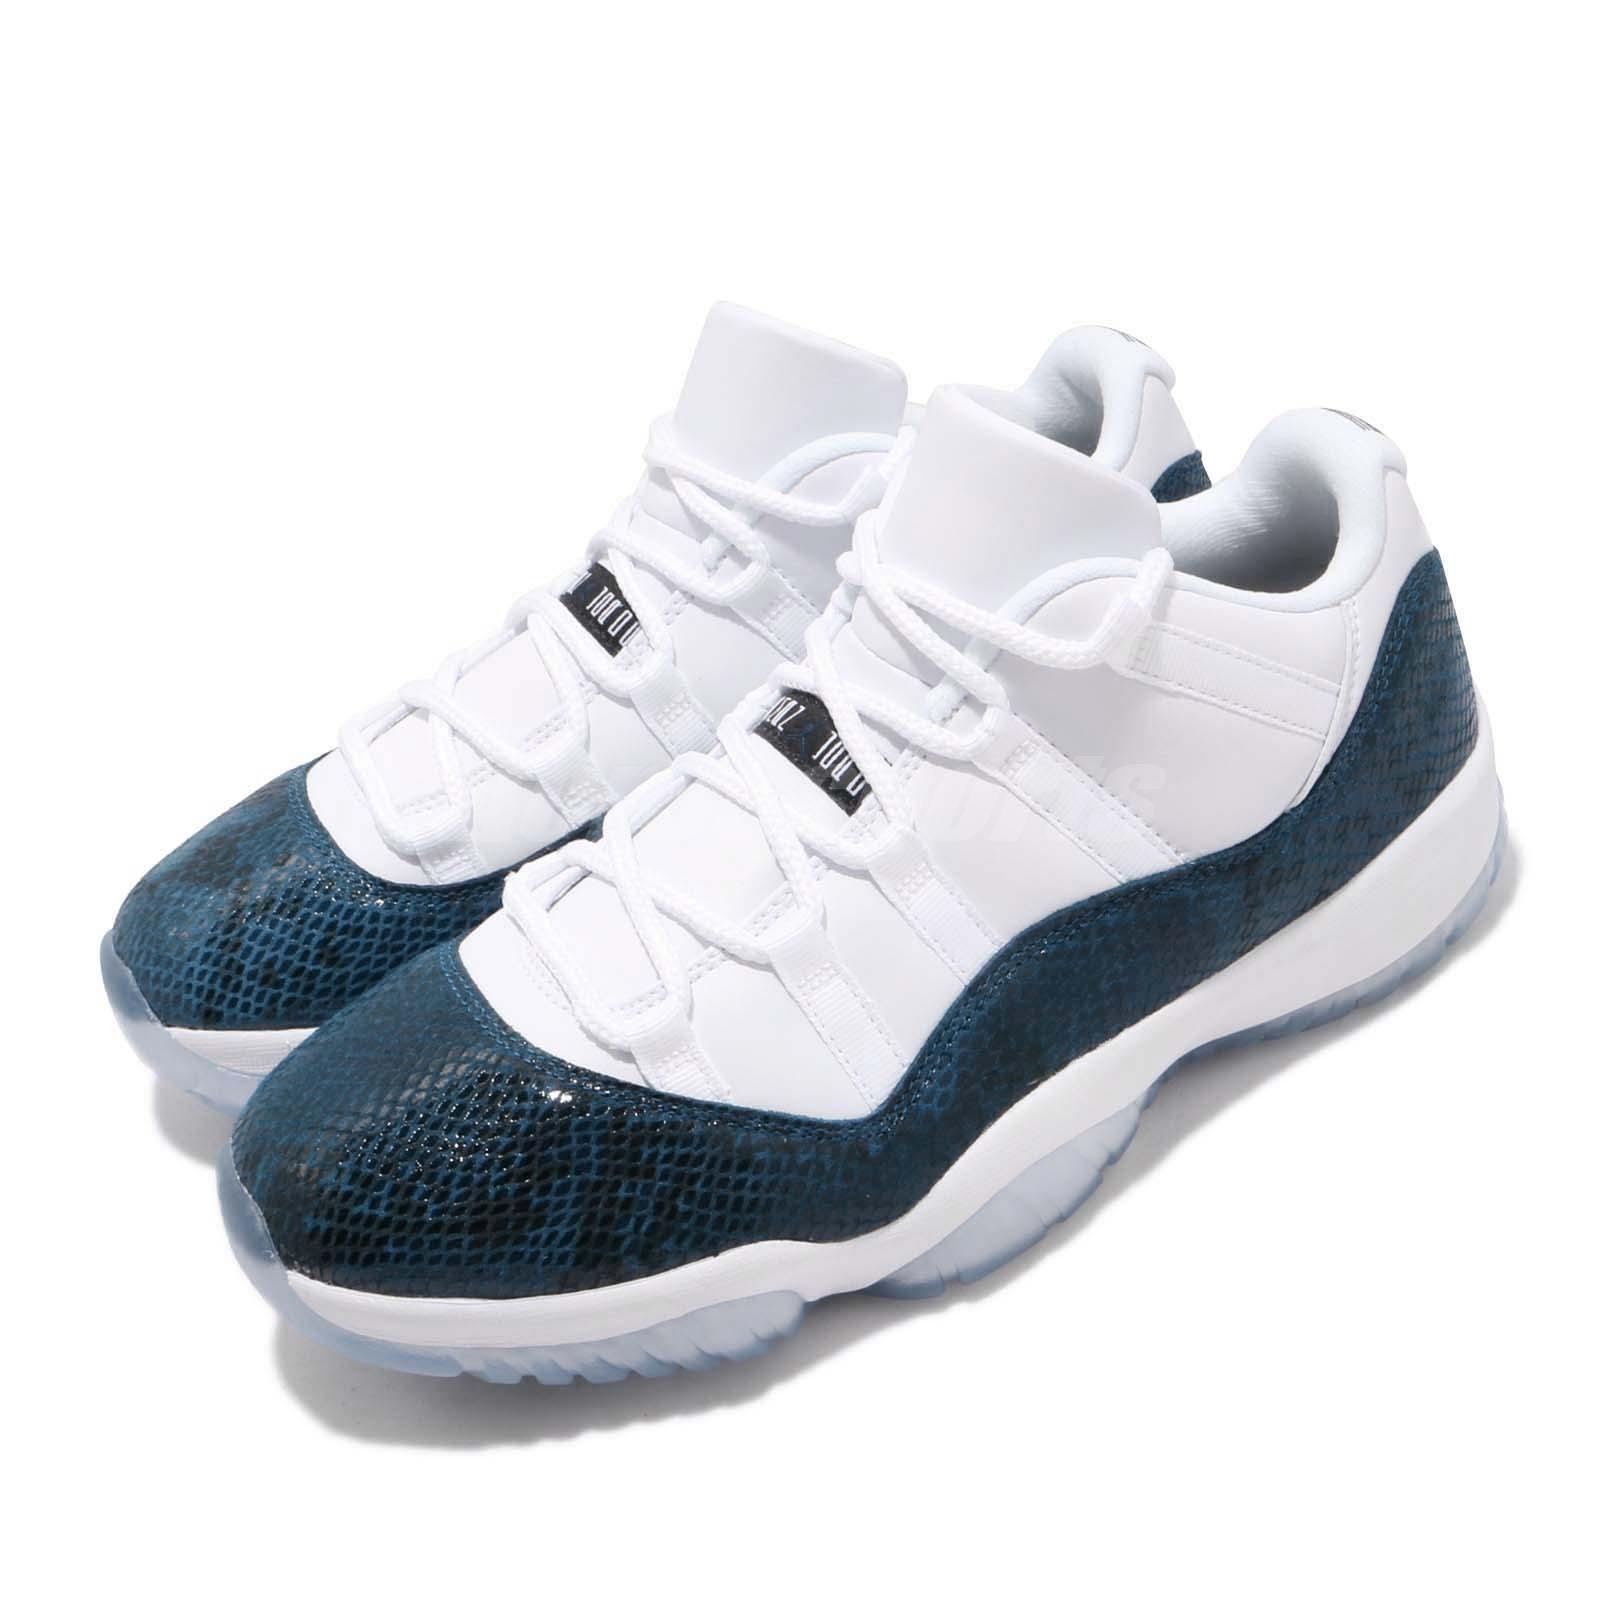 cd47251194fc Nike Air Jordan 11 Retro Low XI AJ11 Blue Navy Snakeskin Men Shoes ...